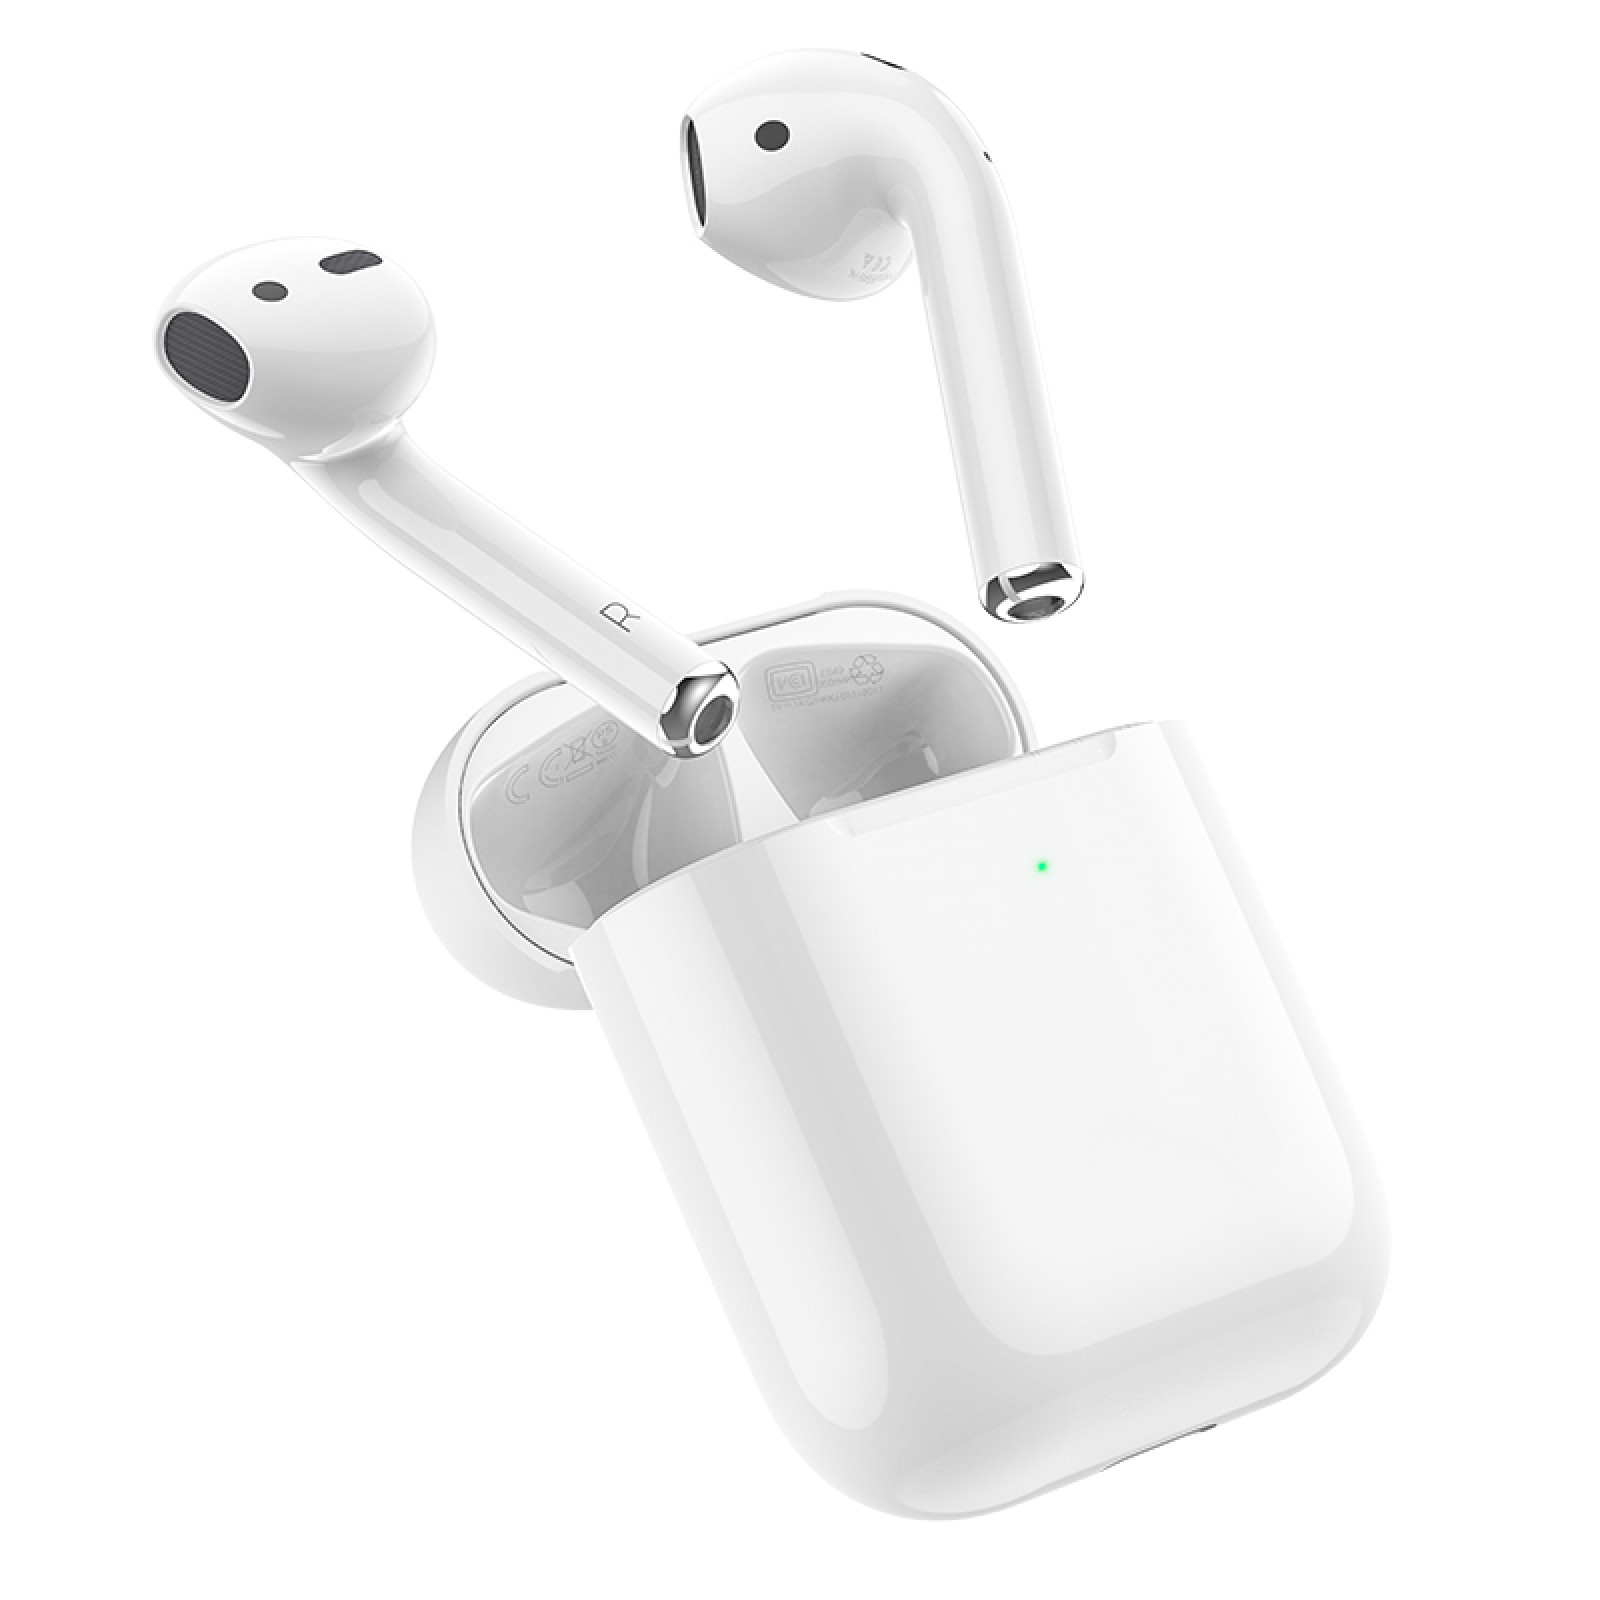 Bluetooth слушалки Hoco EW02 Original series true wireless BT headset - Бели